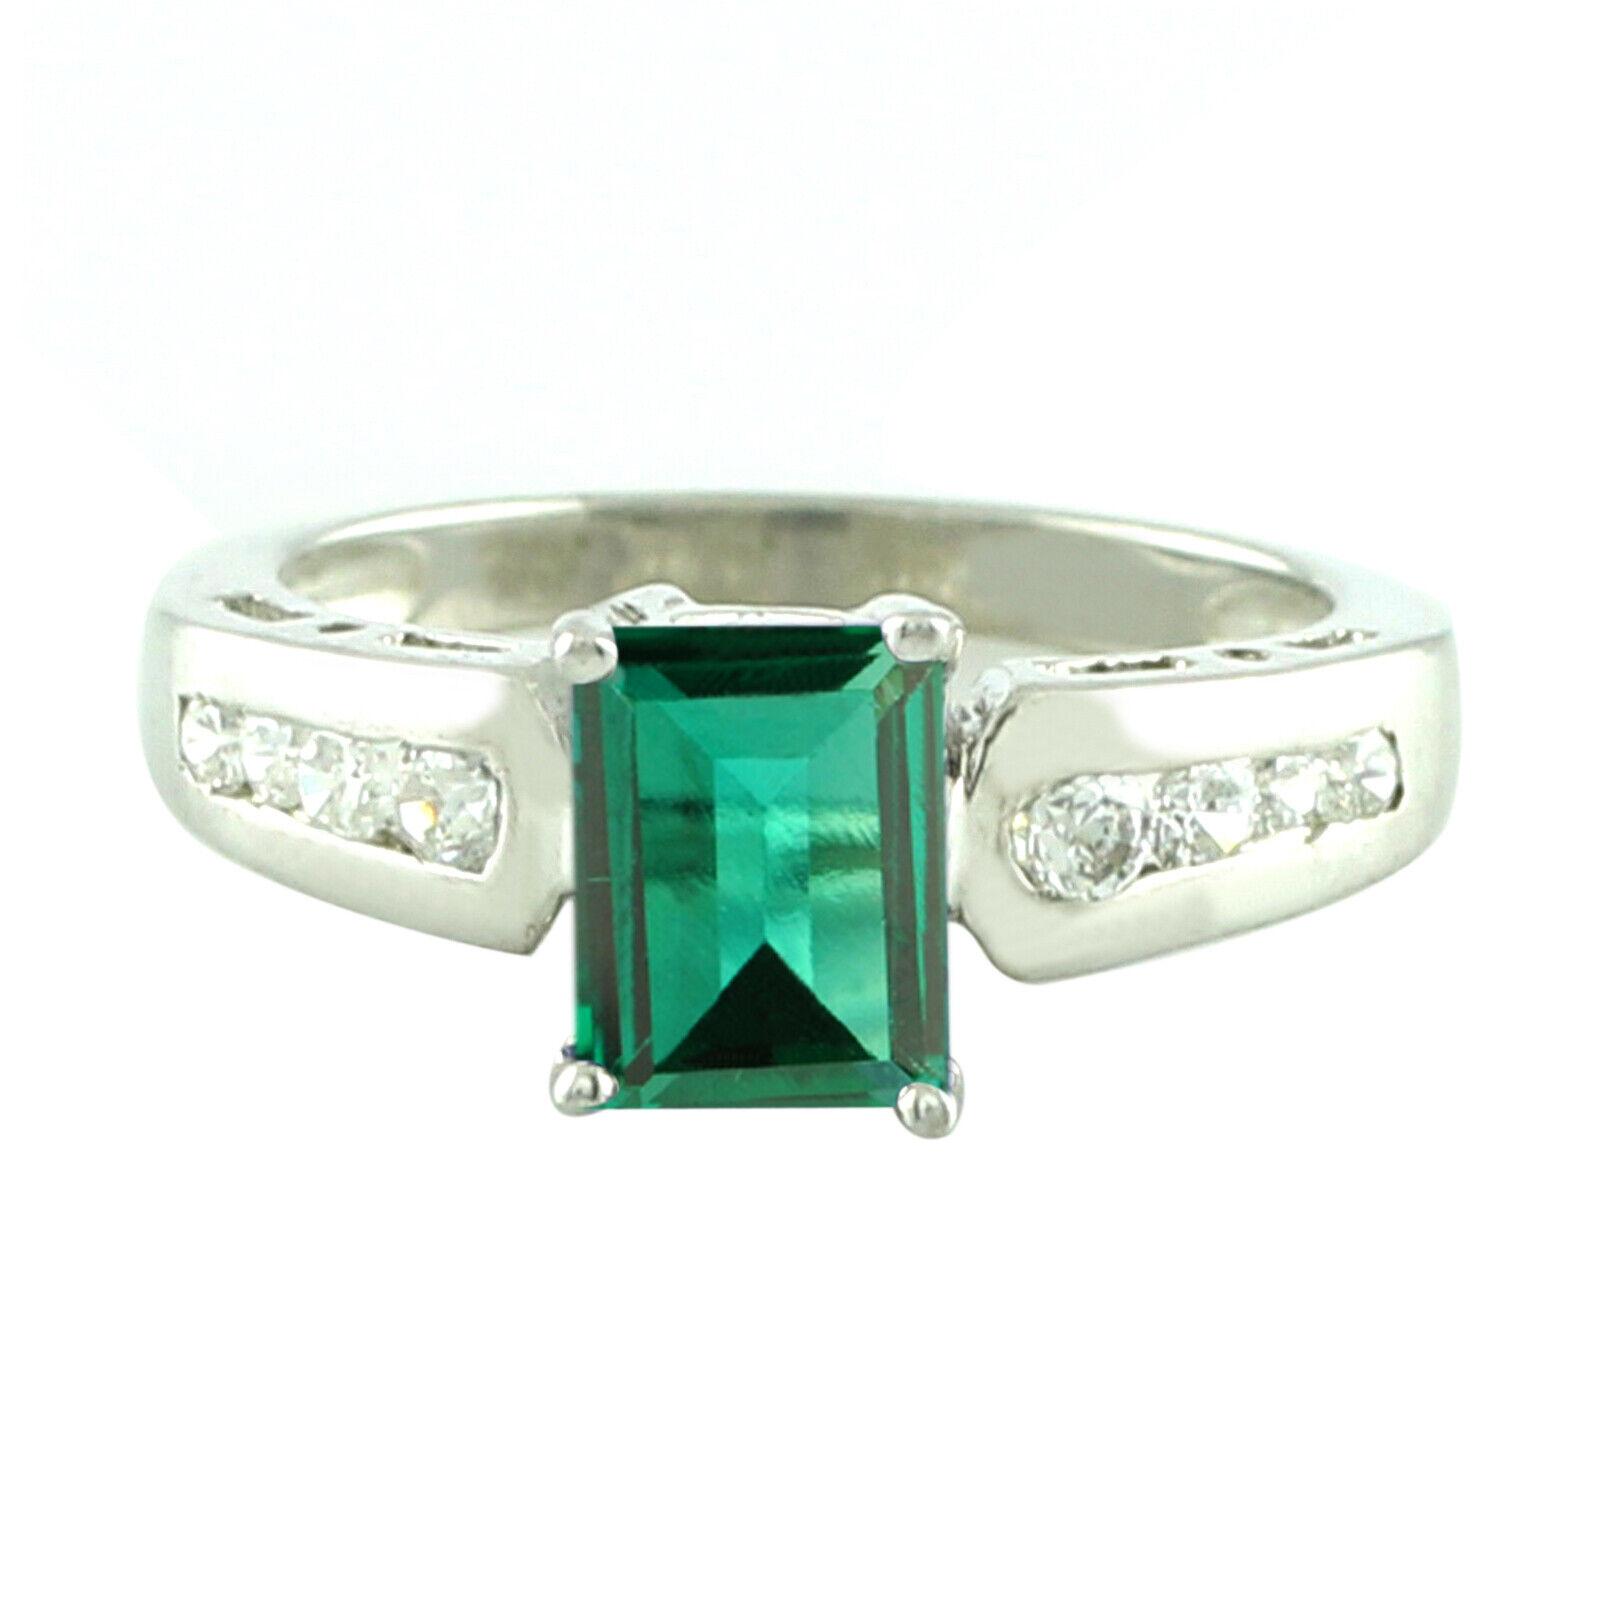 1.50 Carat 14KT White gold Natural Green Emerald EGL Certified Diamond Ring